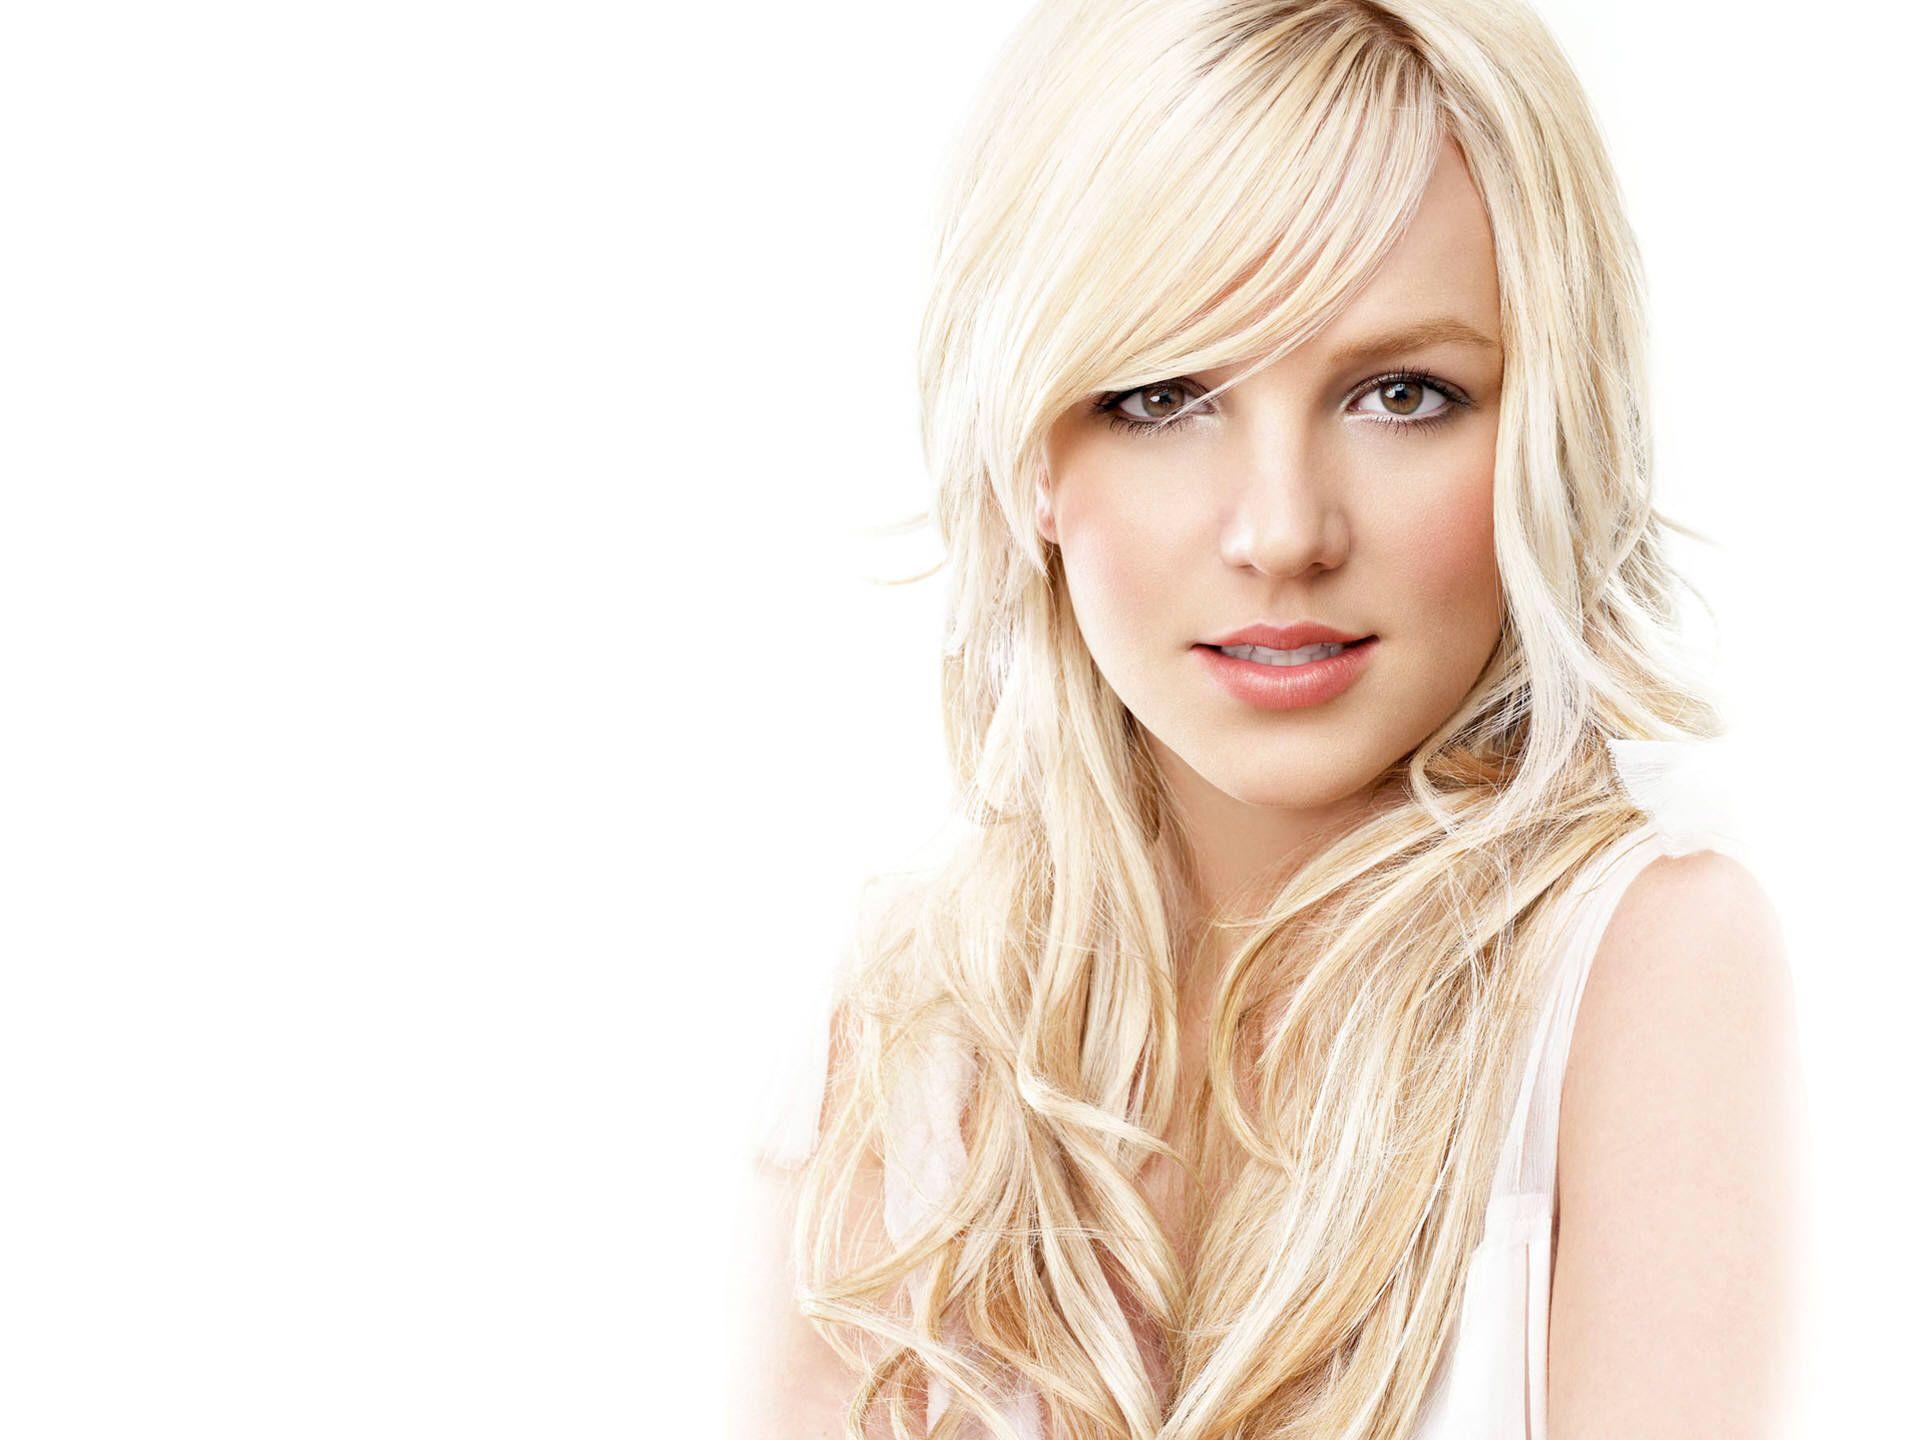 Britney Spears HD Wallpapers Free latest Britney Spears